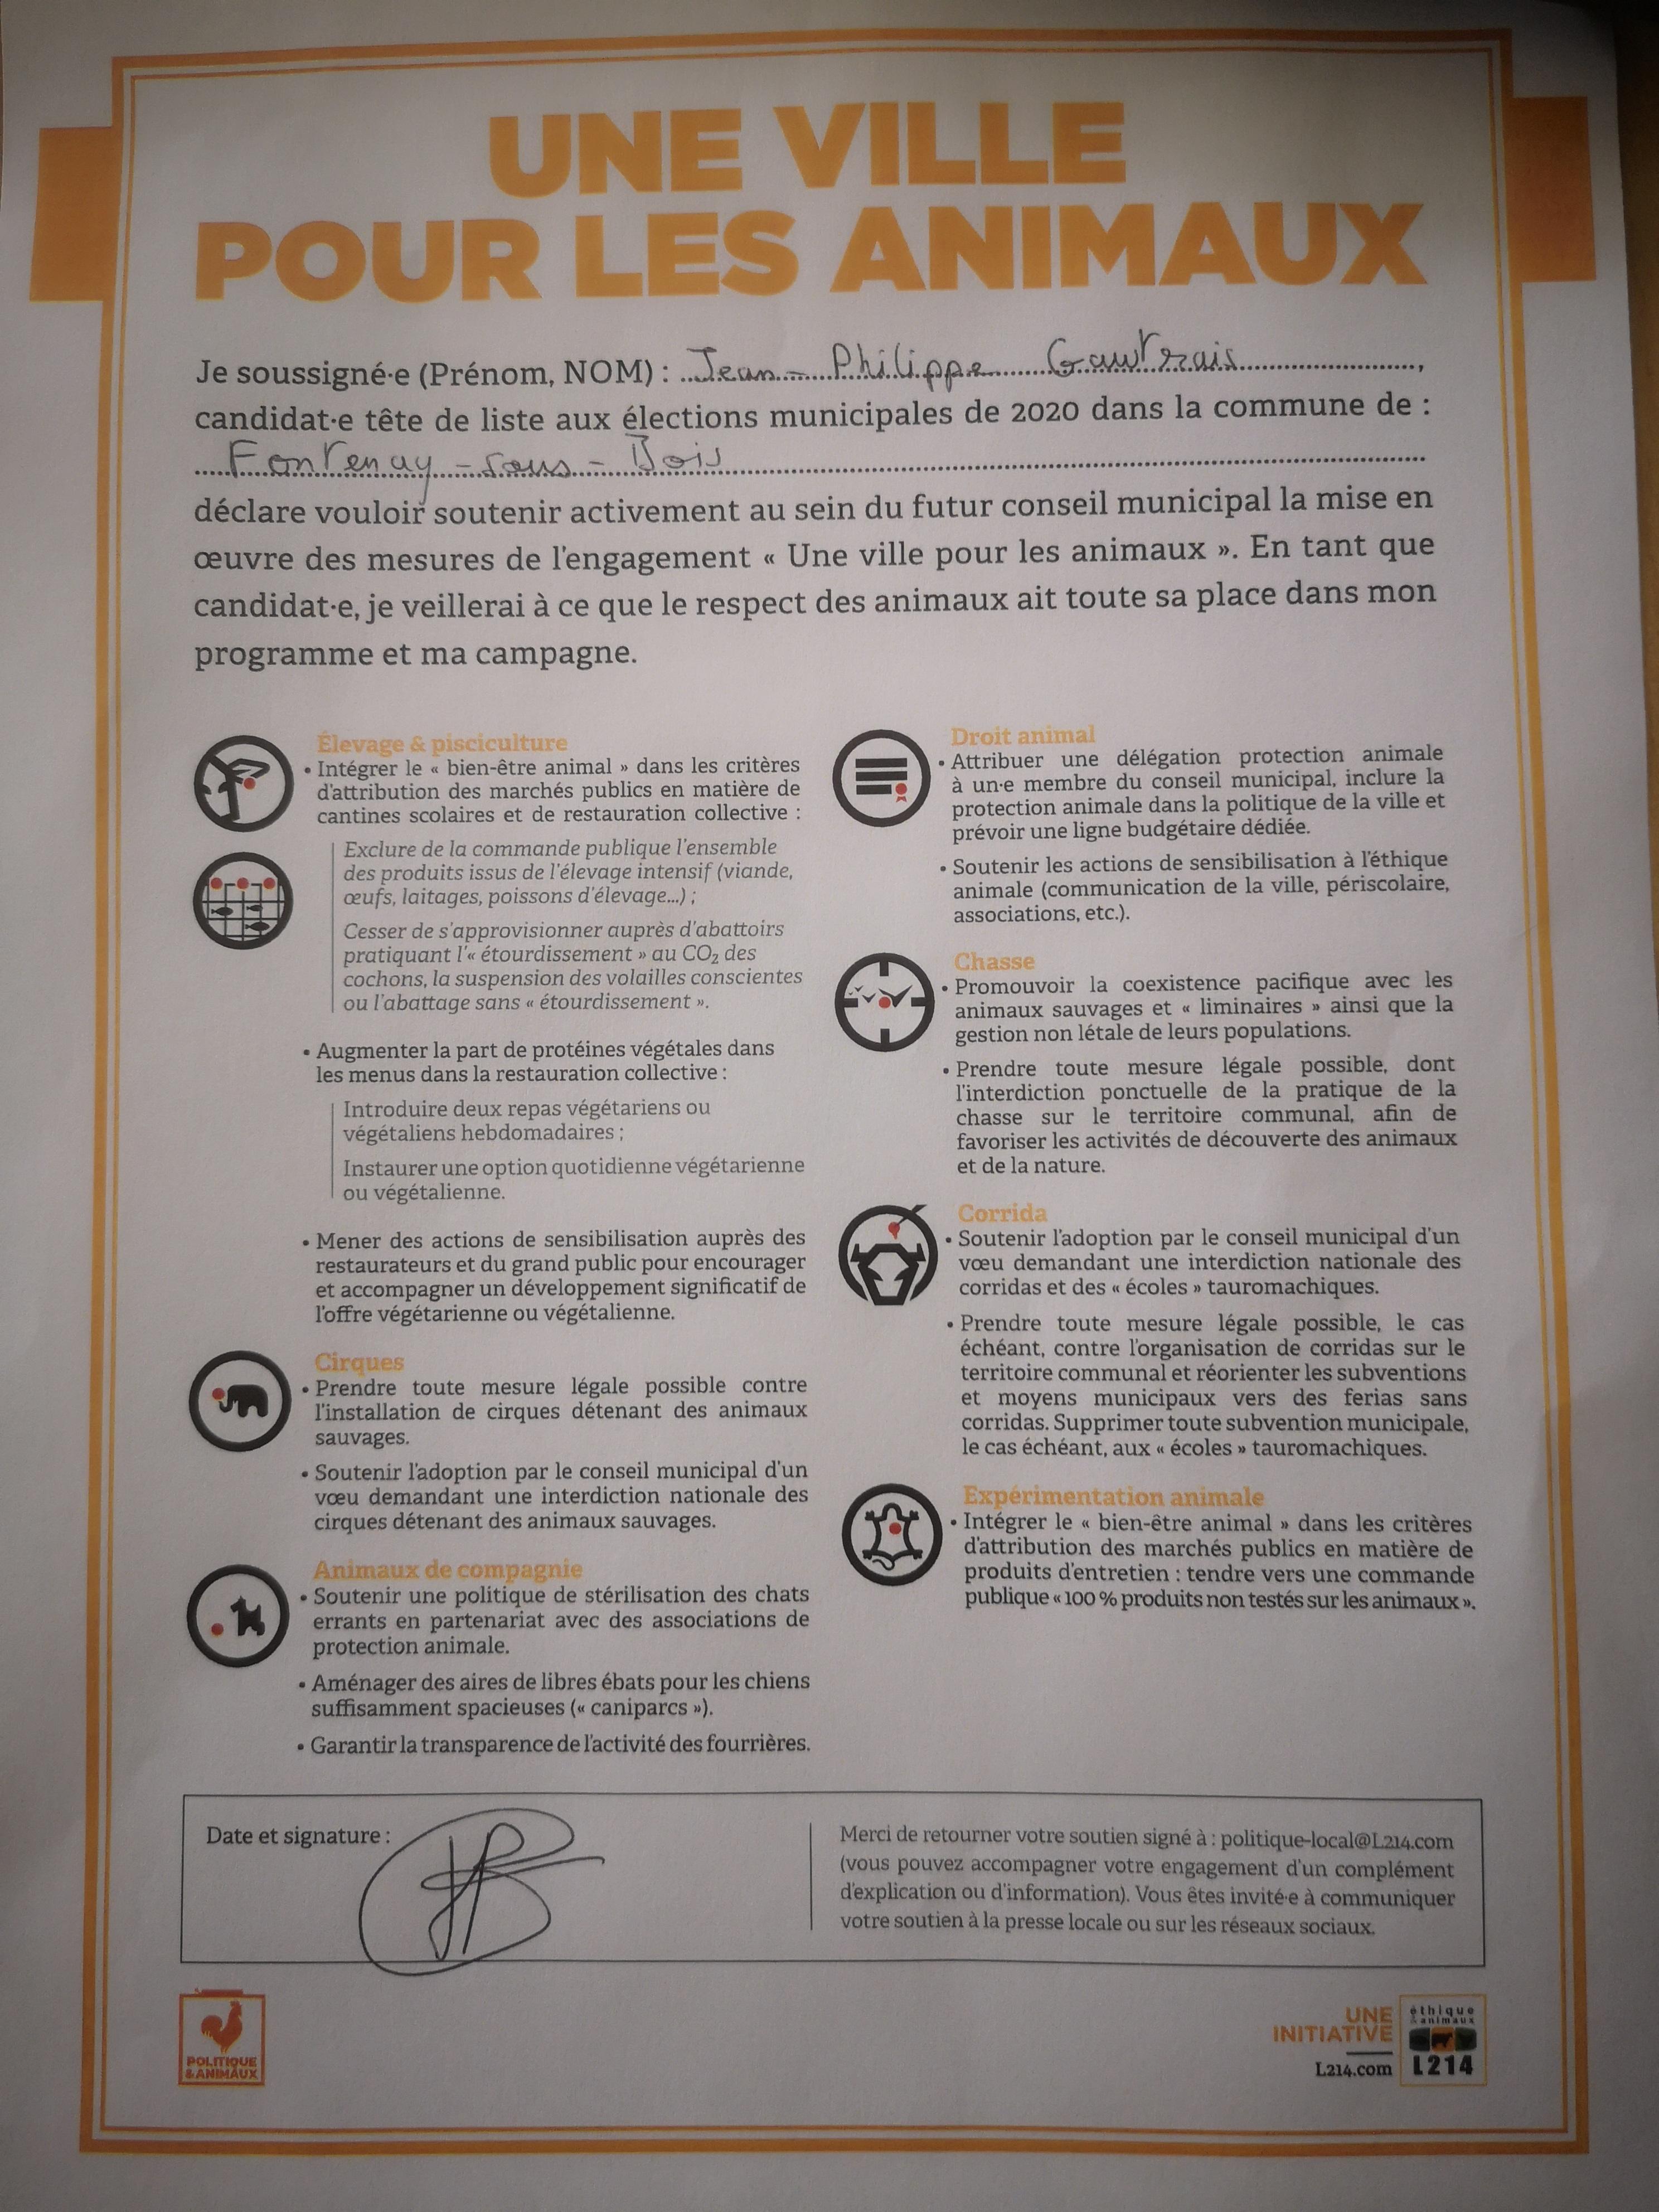 UVPA-Jean-Philippe_Gautrais